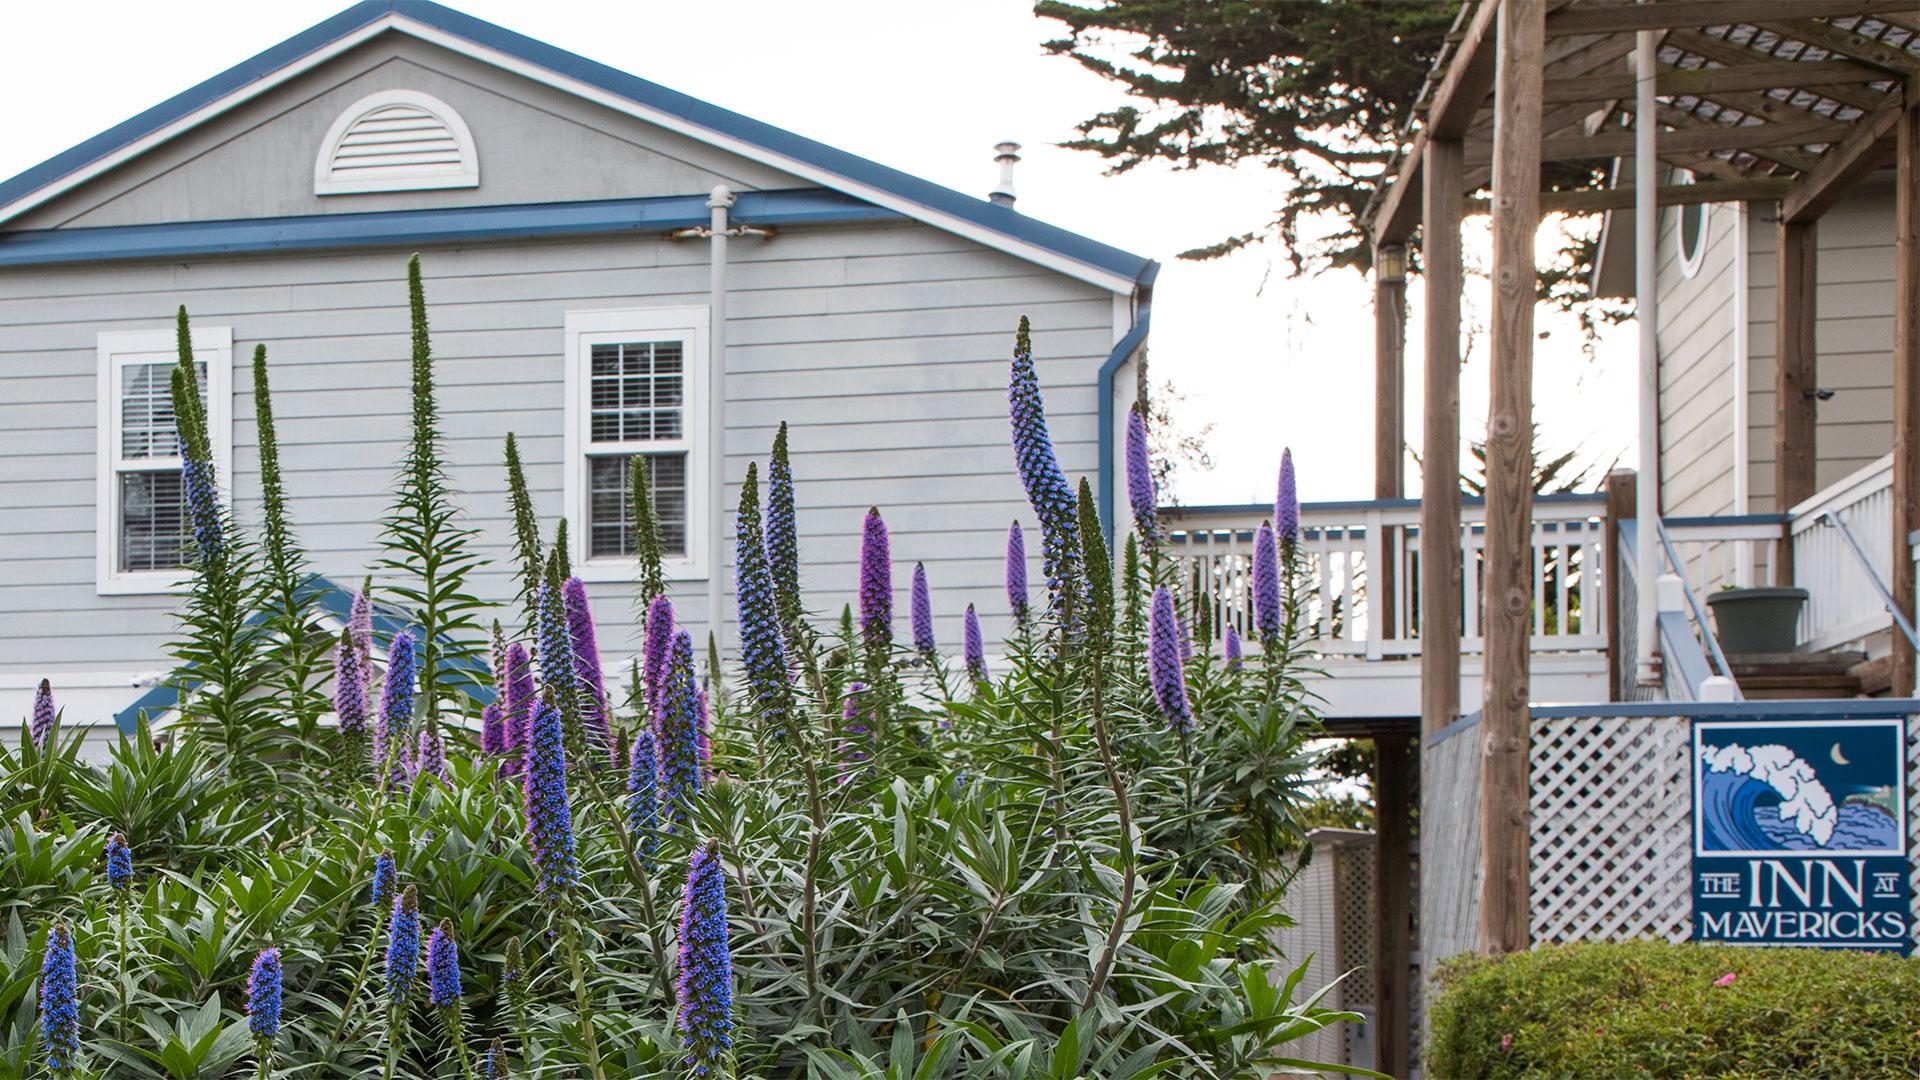 Inn at Mavricks In Springtime With Pride Of Madeira Flowers